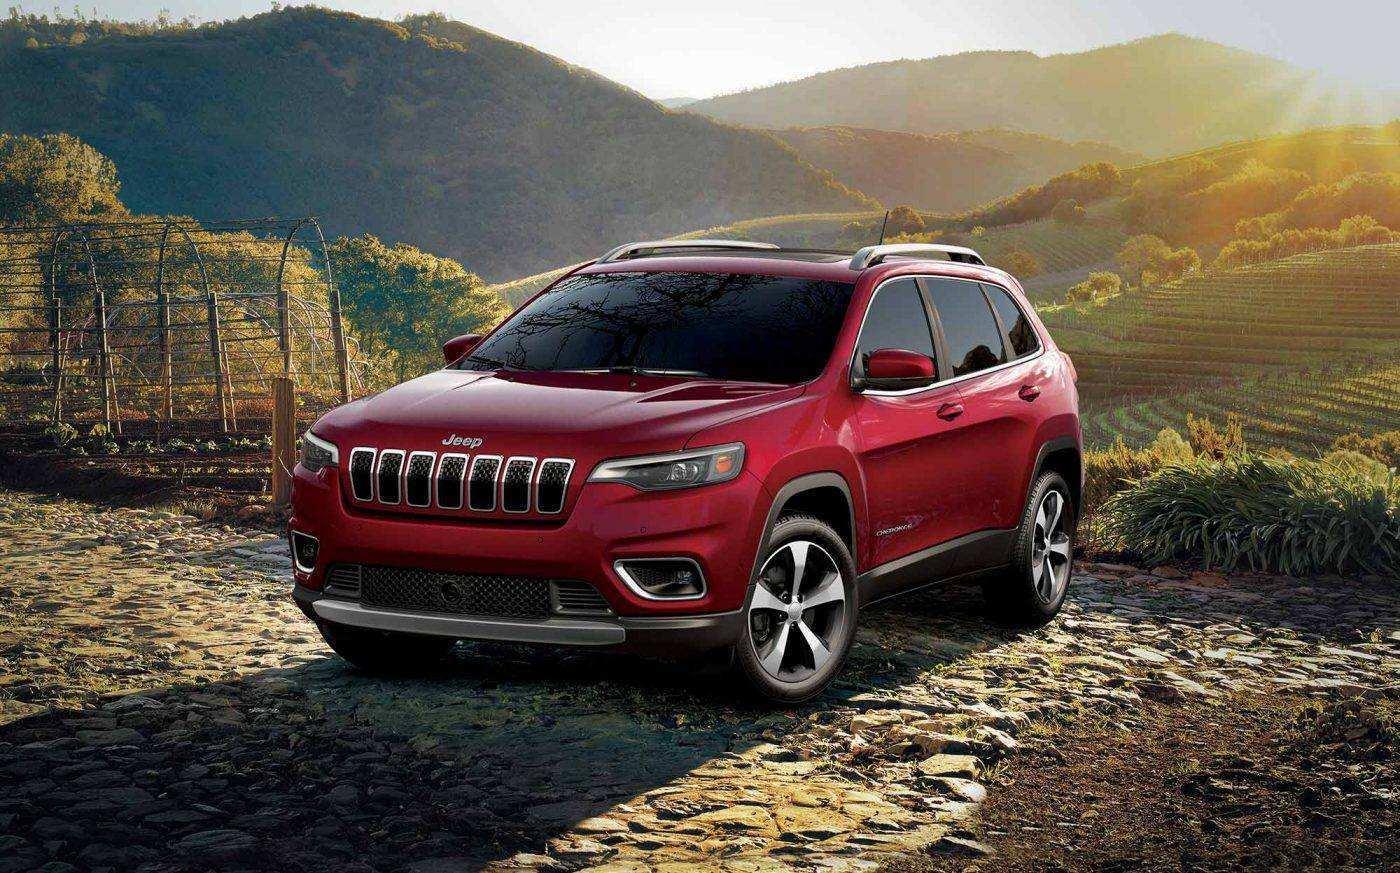 70 Concept of The 2019 Jeep Cherokee Vs Kia Sorento New Review Release Date by The 2019 Jeep Cherokee Vs Kia Sorento New Review